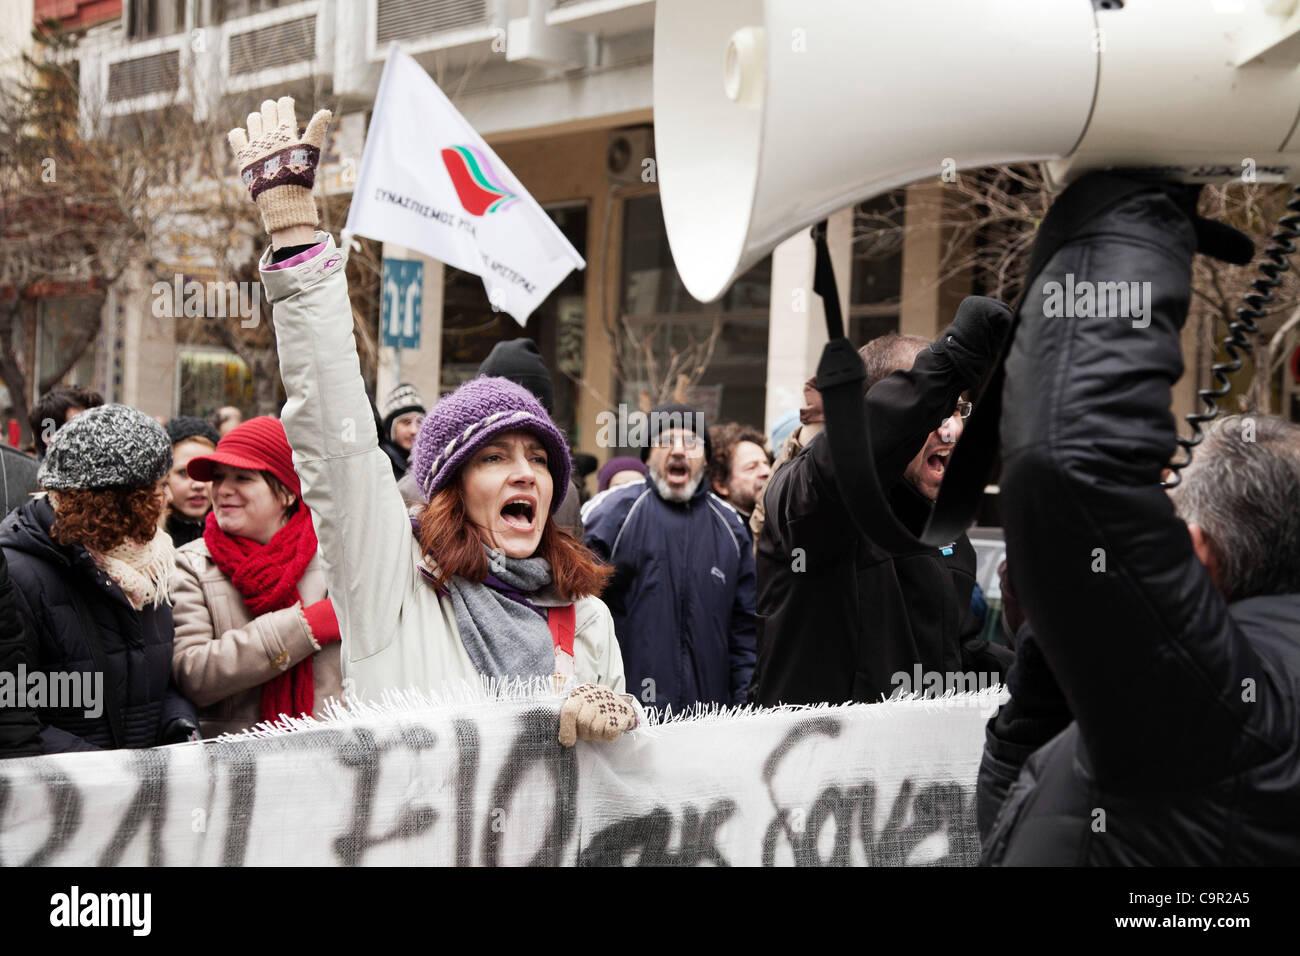 Greek protester shouting slogans against the new stringent economic measures. 48-hour nationwide strike. Protests - Stock Image